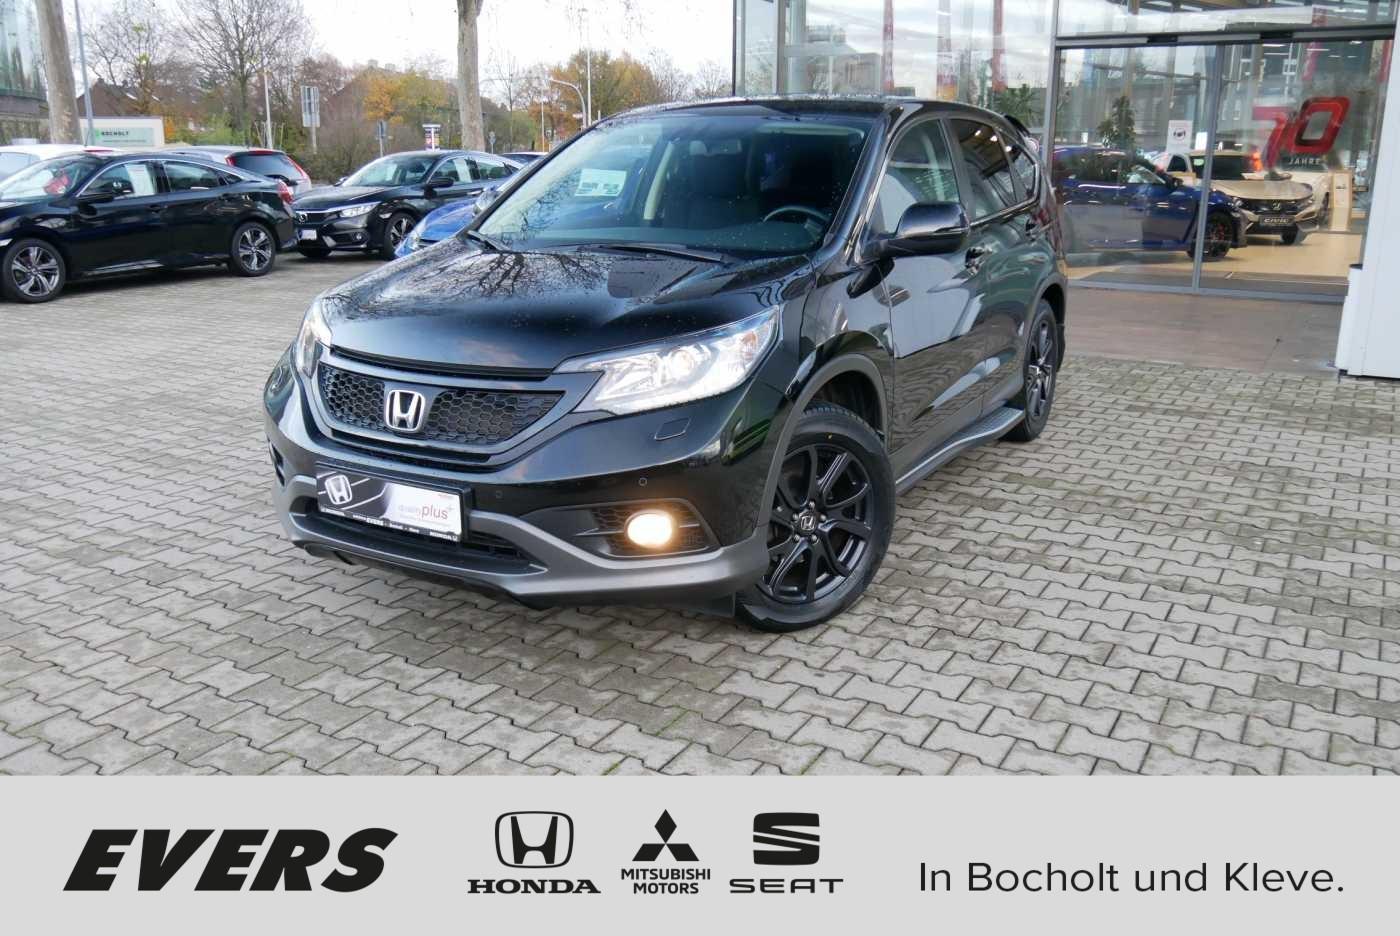 Honda CR-V 1.6 DTEC 2WD ELEGANCE BLACK EDITION, Jahr 2014, Diesel